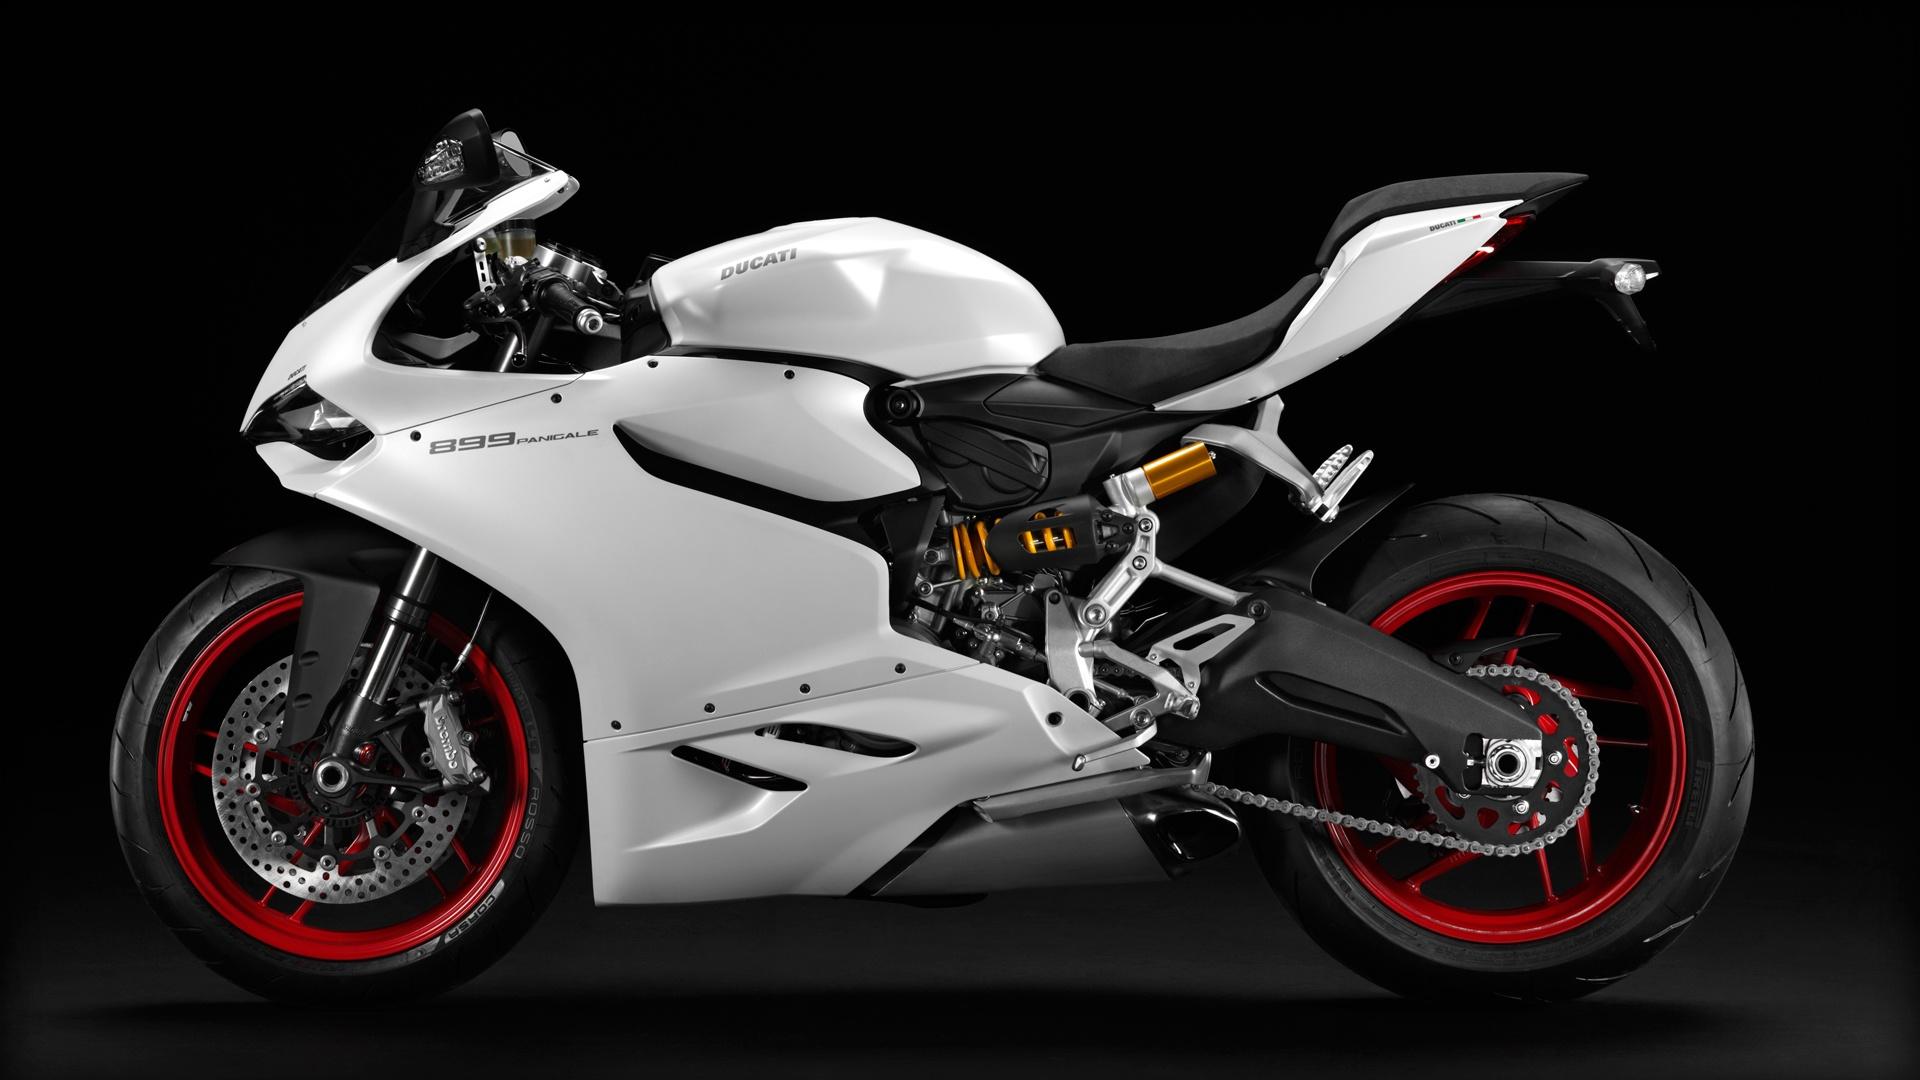 Ducati 959 Panigale revealed